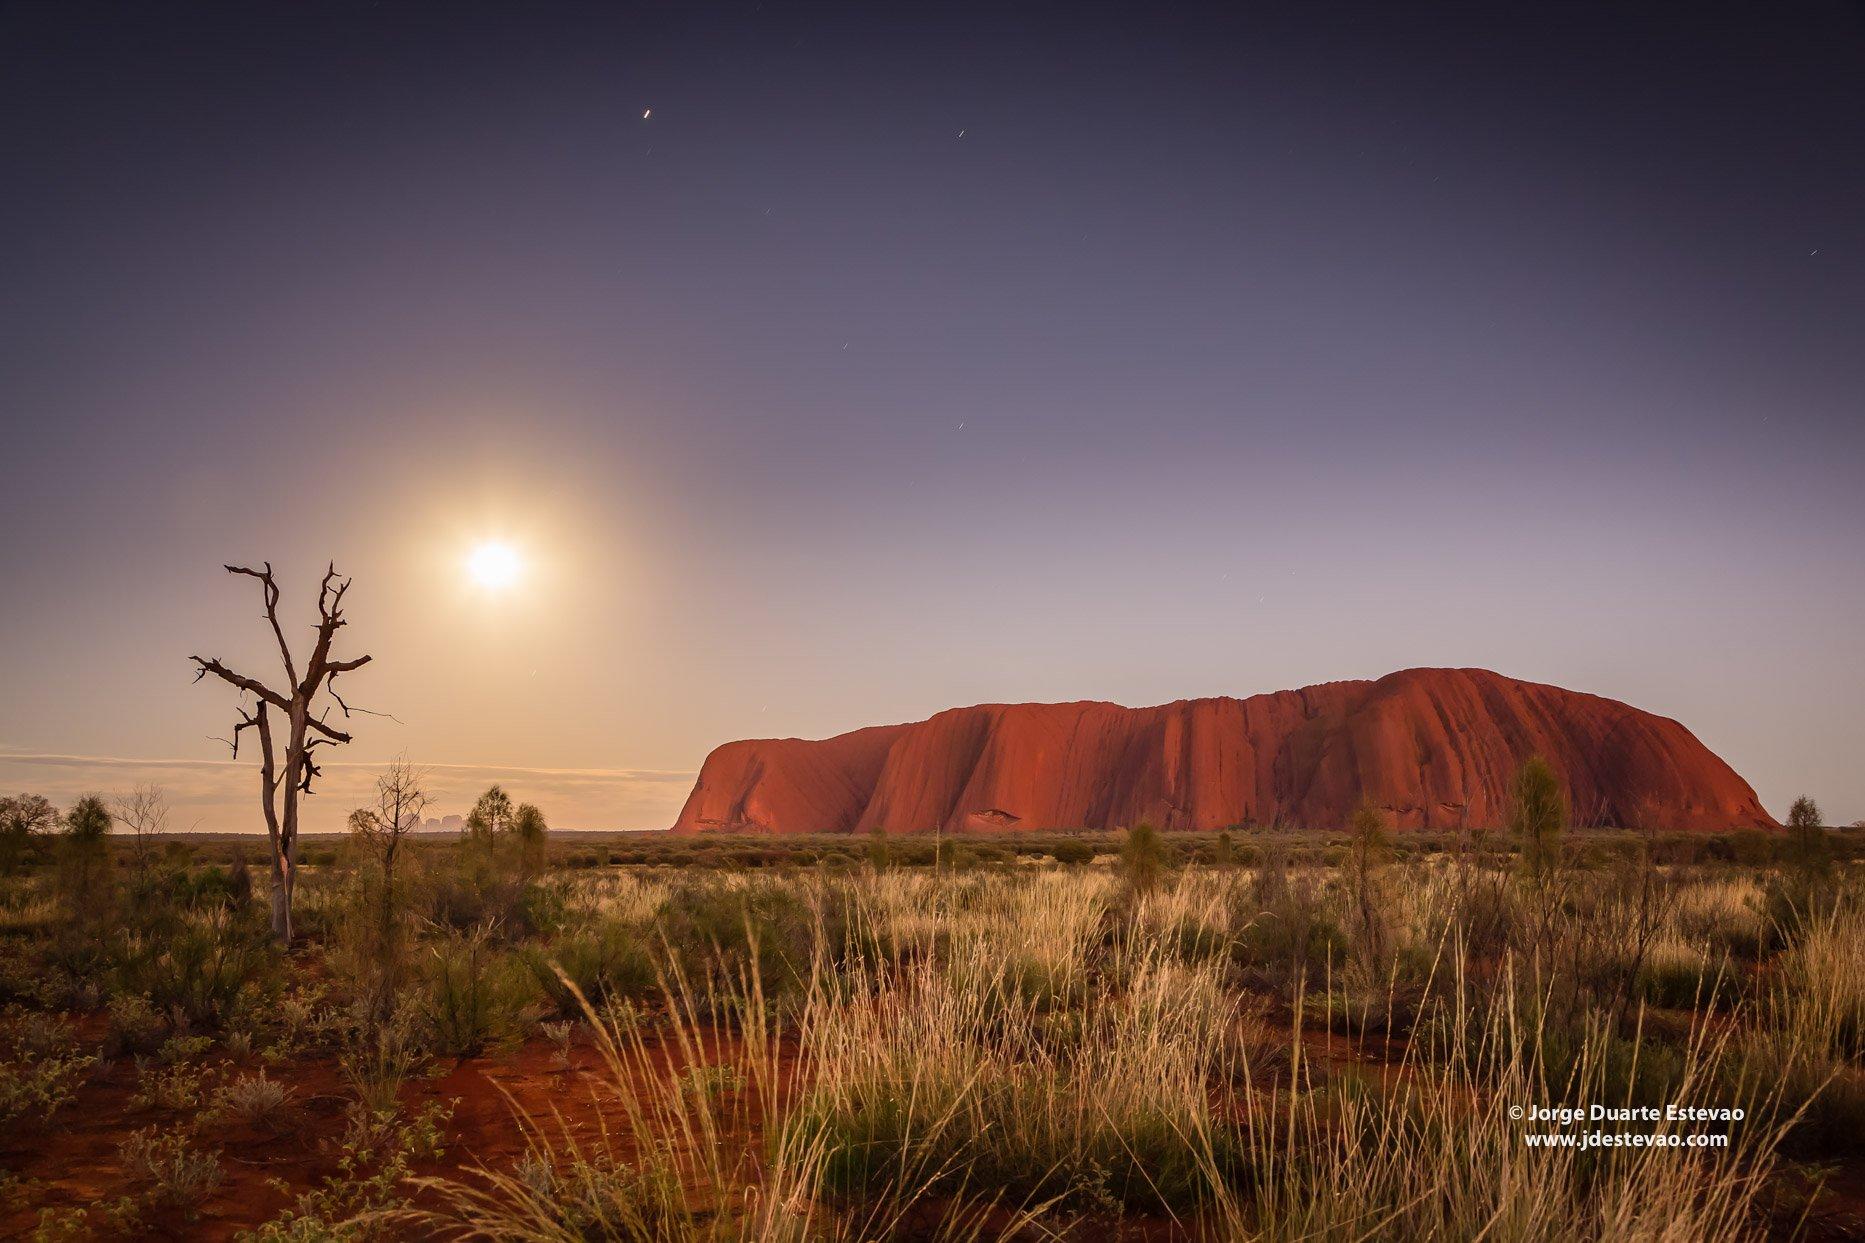 Sunrise Uluru Ayers Rock Uluru-Kata Tjuta National Park Northern territory australia